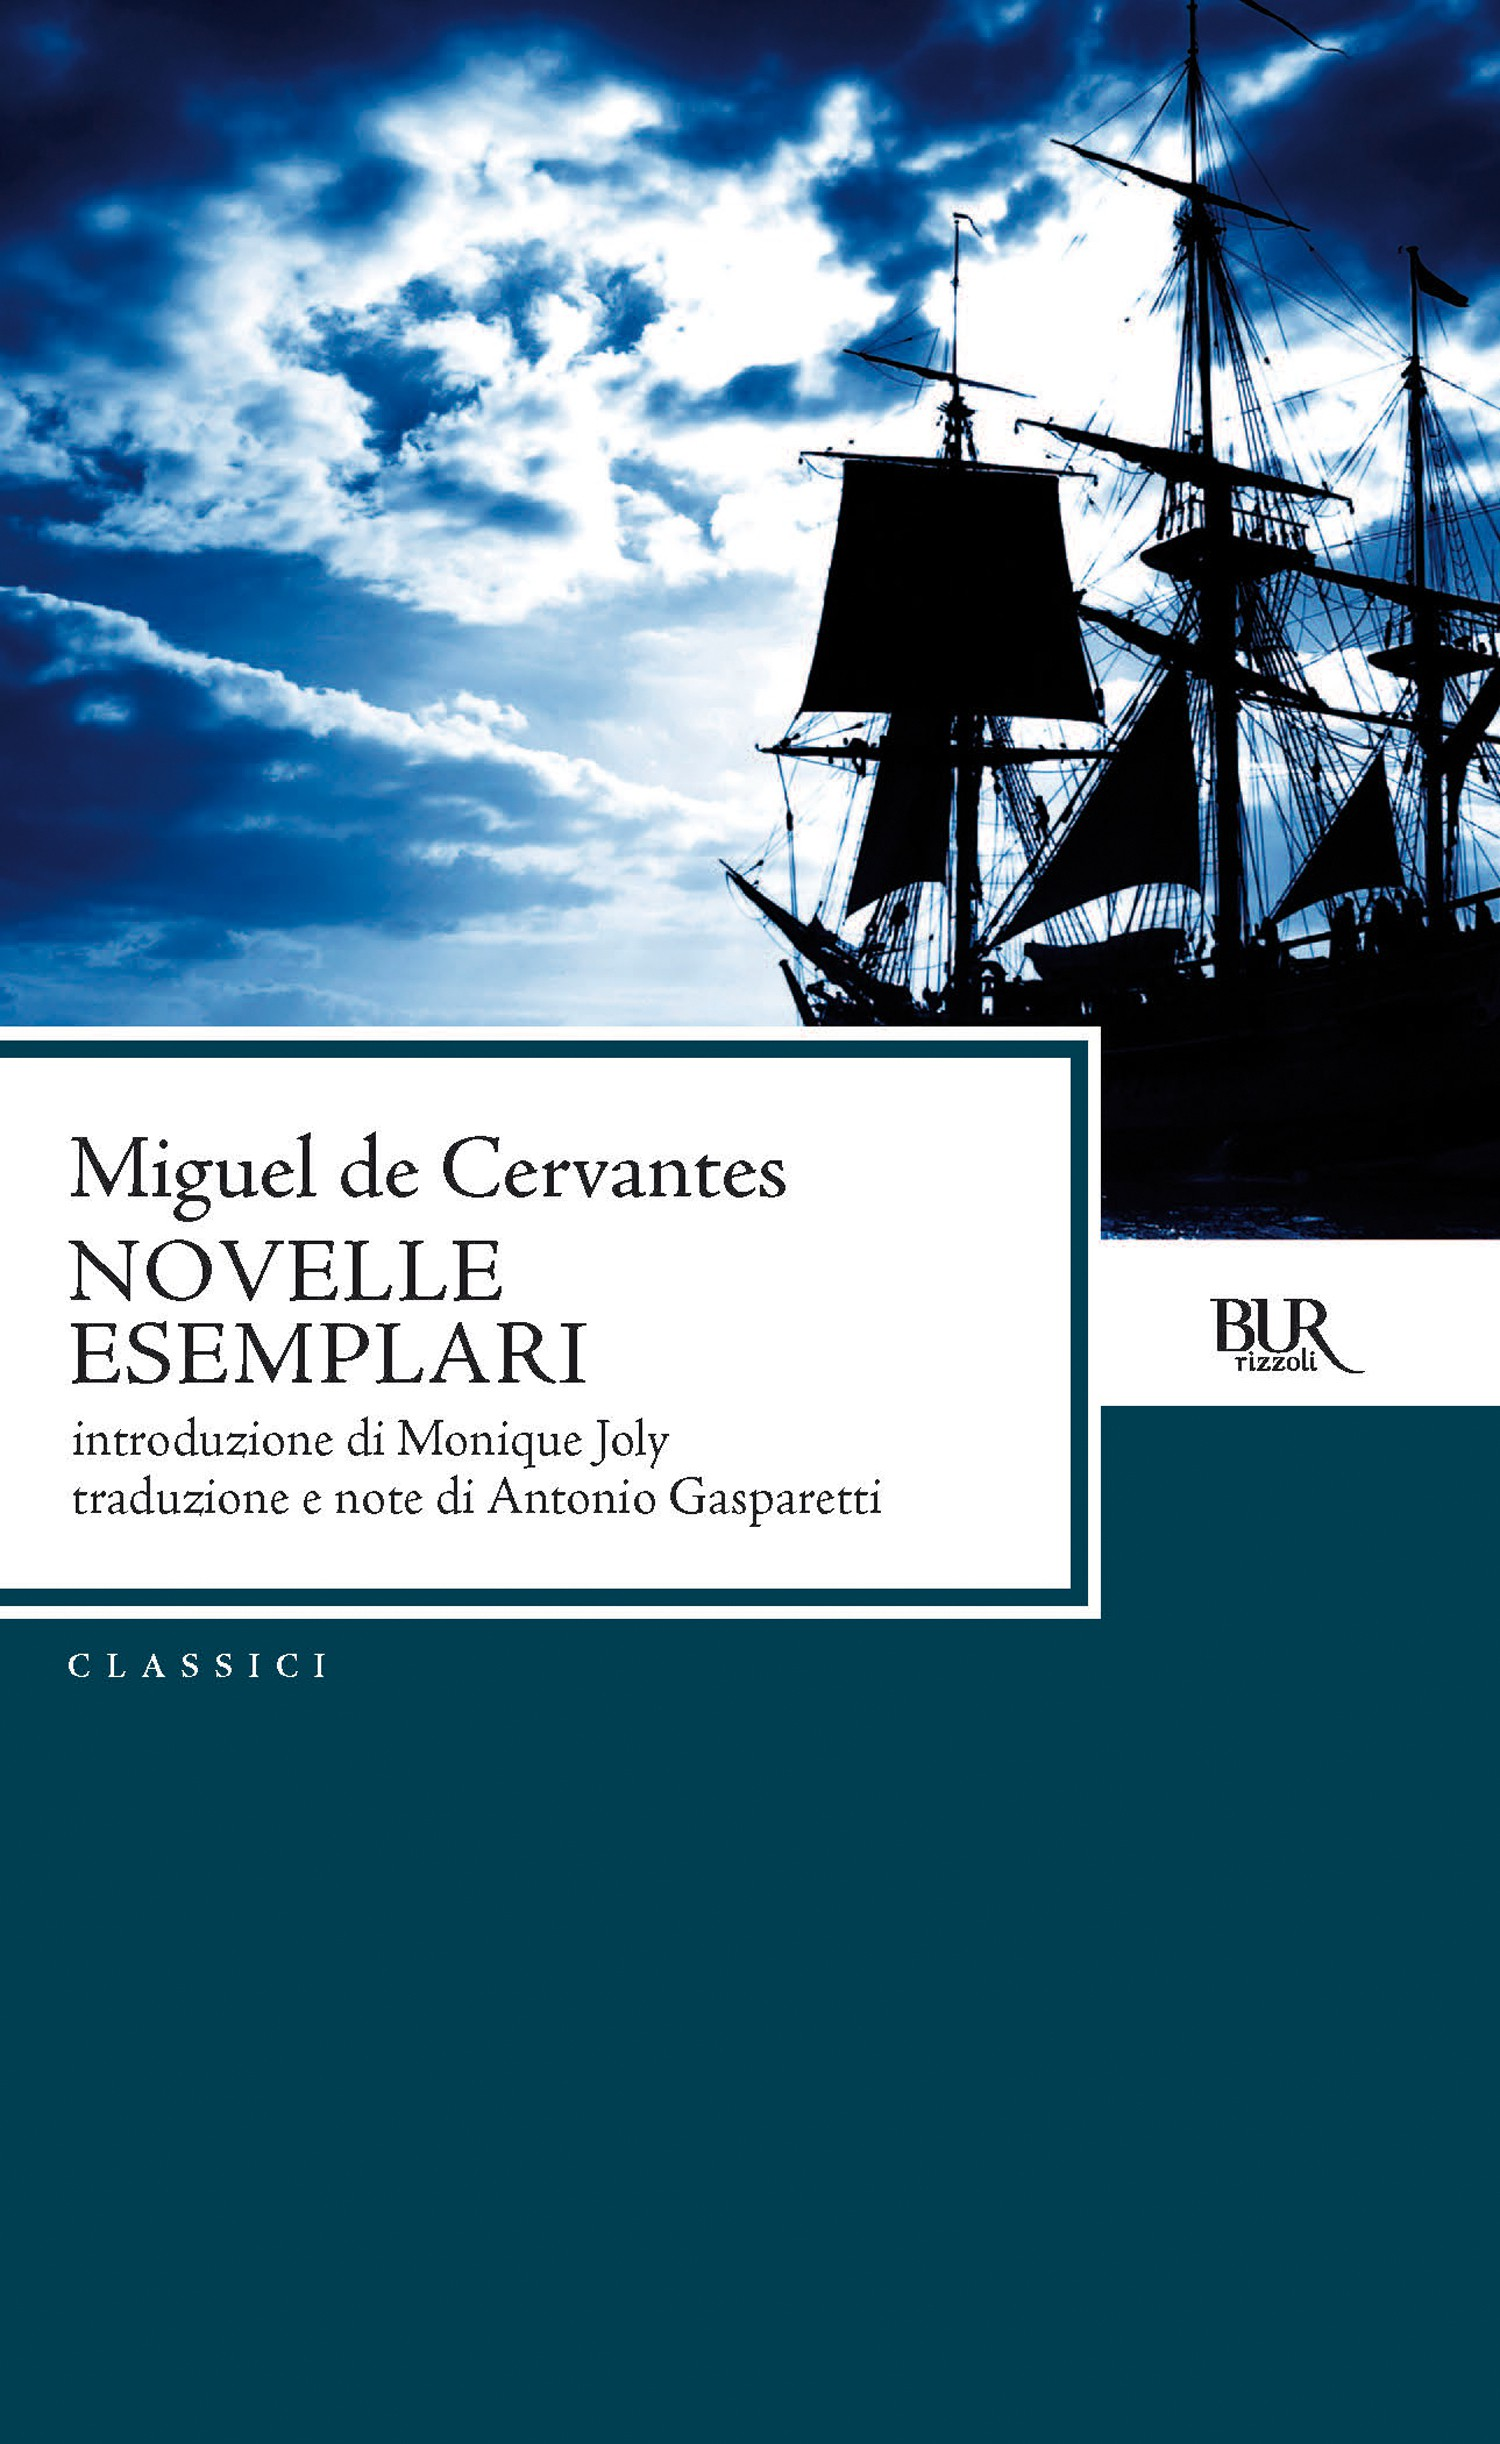 Miguel de Cervantes, Novelle esemplari, Rizzoli